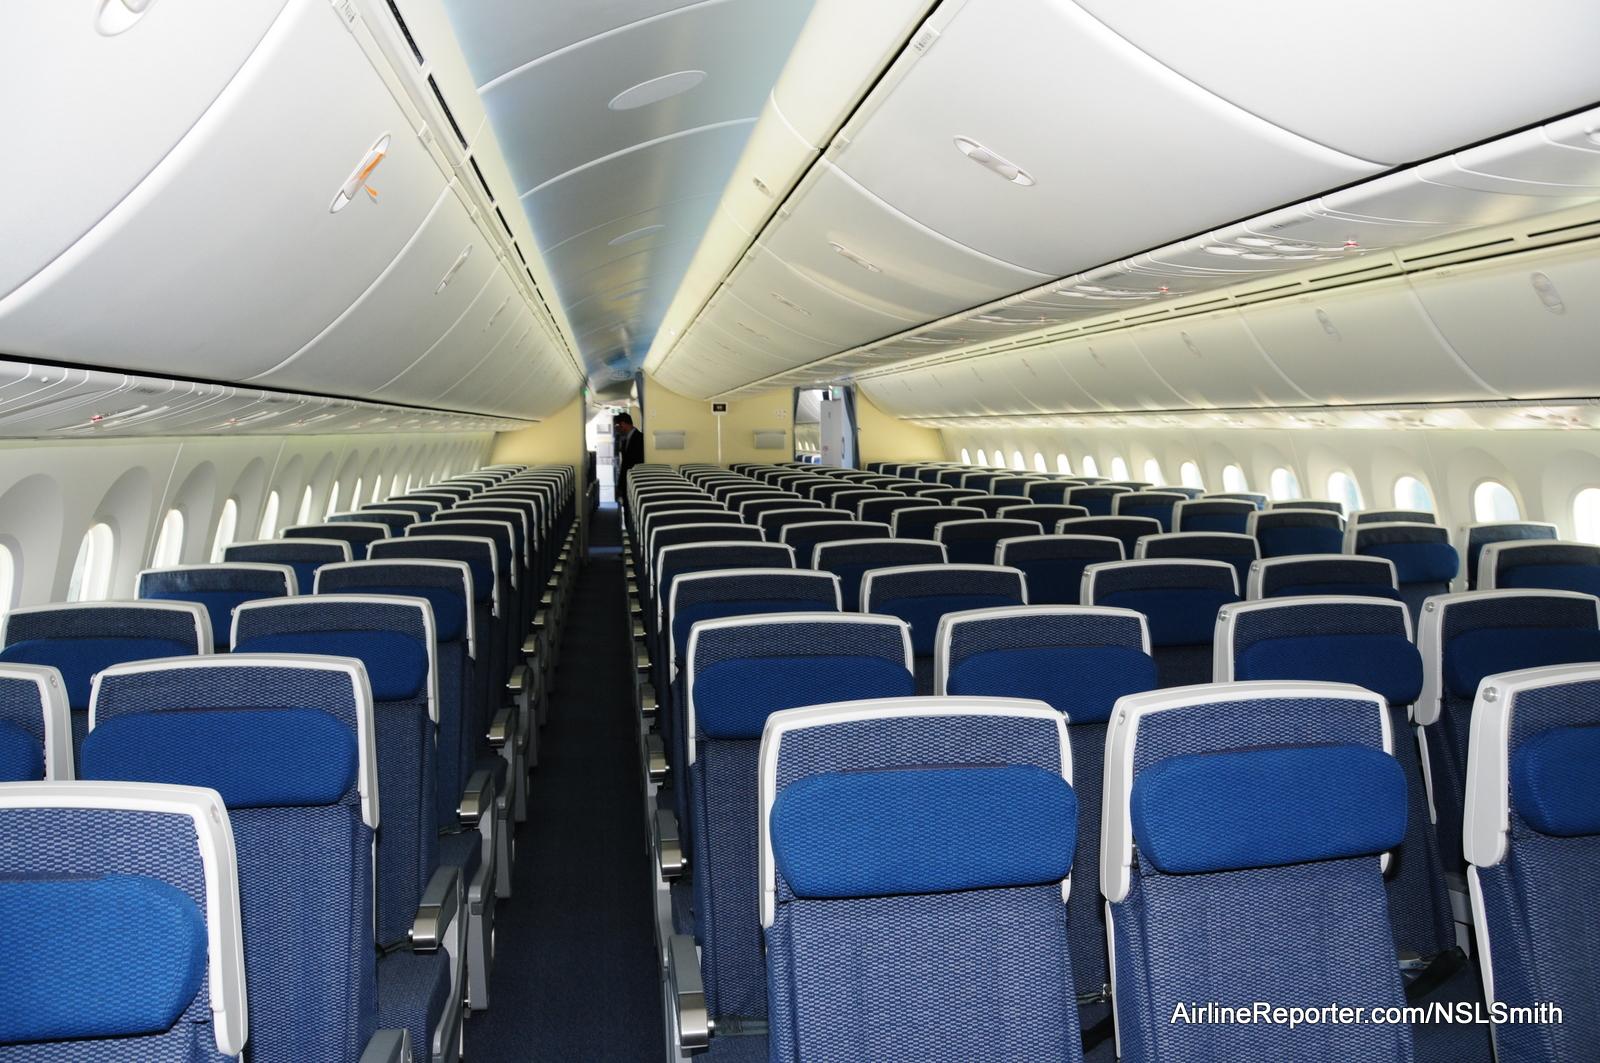 Boeing 787 Dreamliner Interior